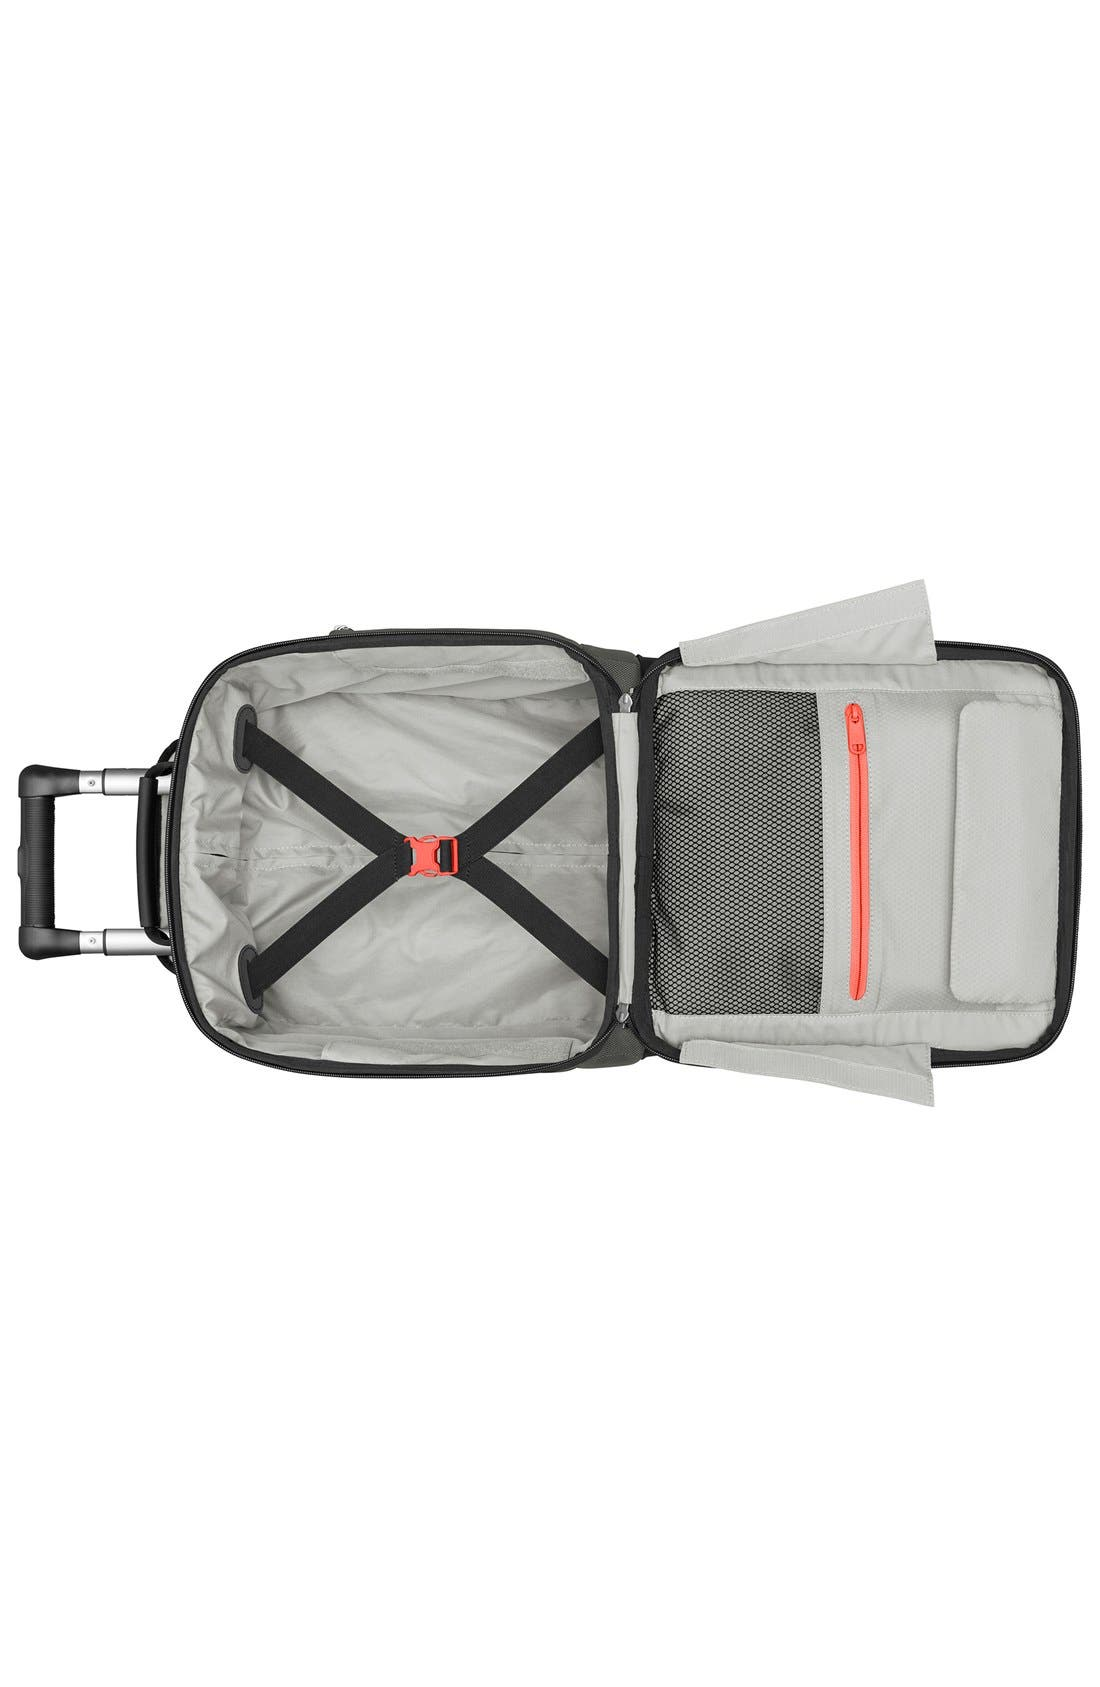 Alternate Image 2  - Victorinox Swiss Army® 'WT 5.0' Wheeled Tote Bag